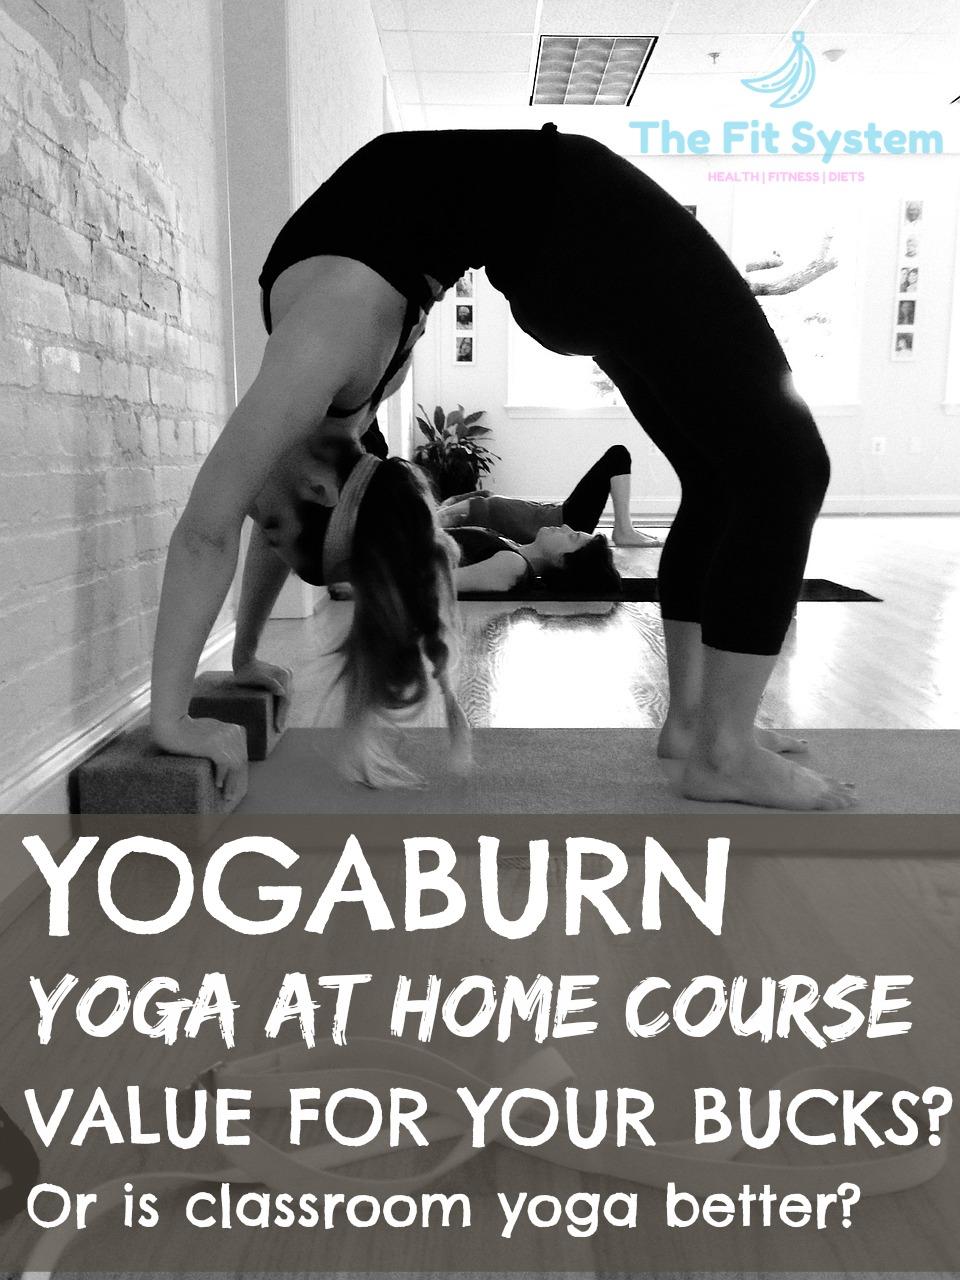 Yogaburn review